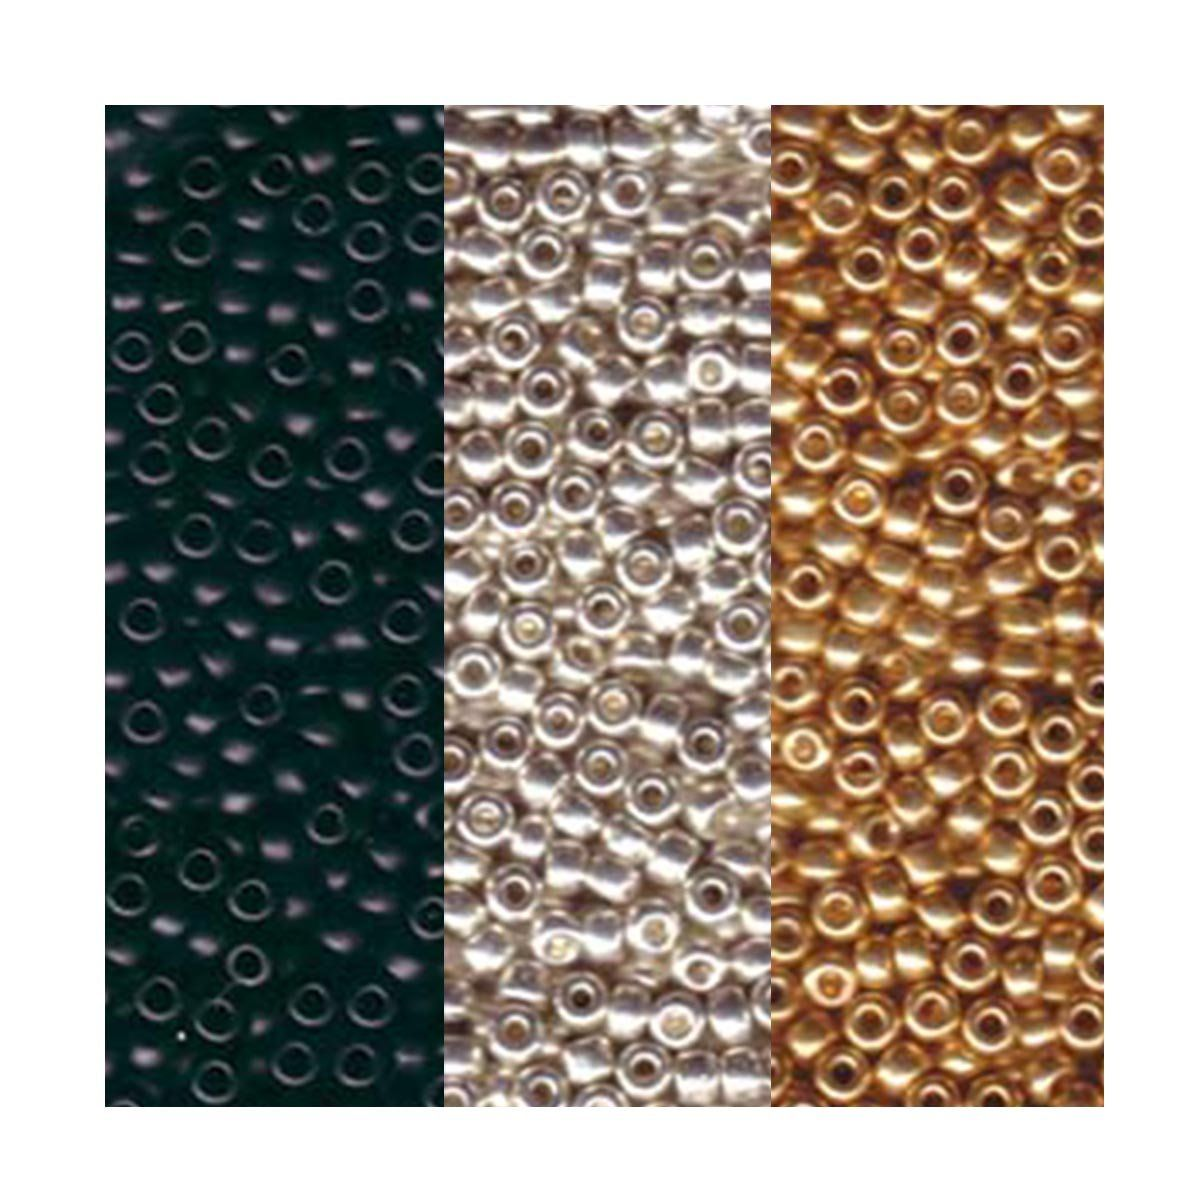 Miyuki Seed Beads 11//0 Galvanised Light Beige Rose Gold Colour 10g